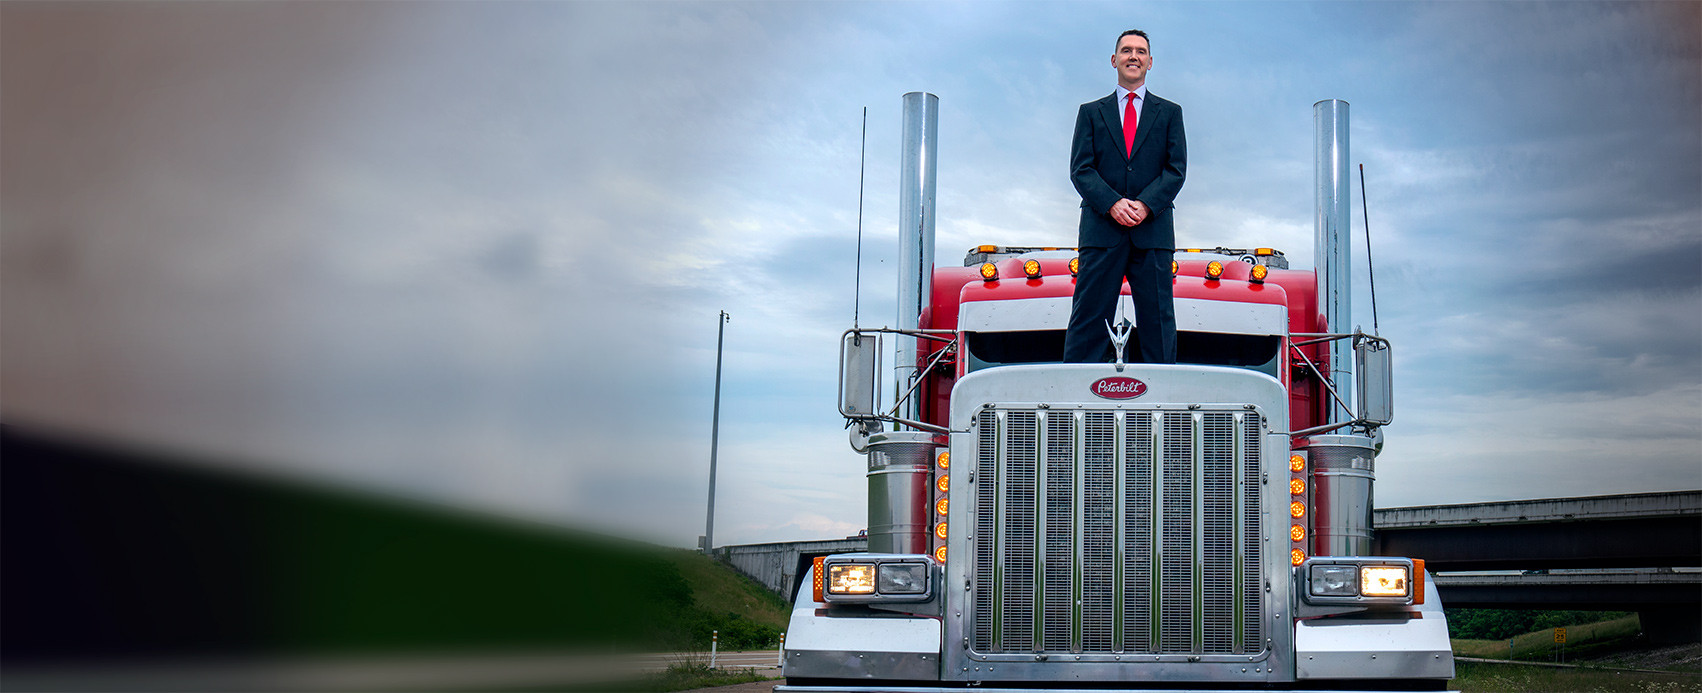 Attorney James Beardsley standing on top of big truck